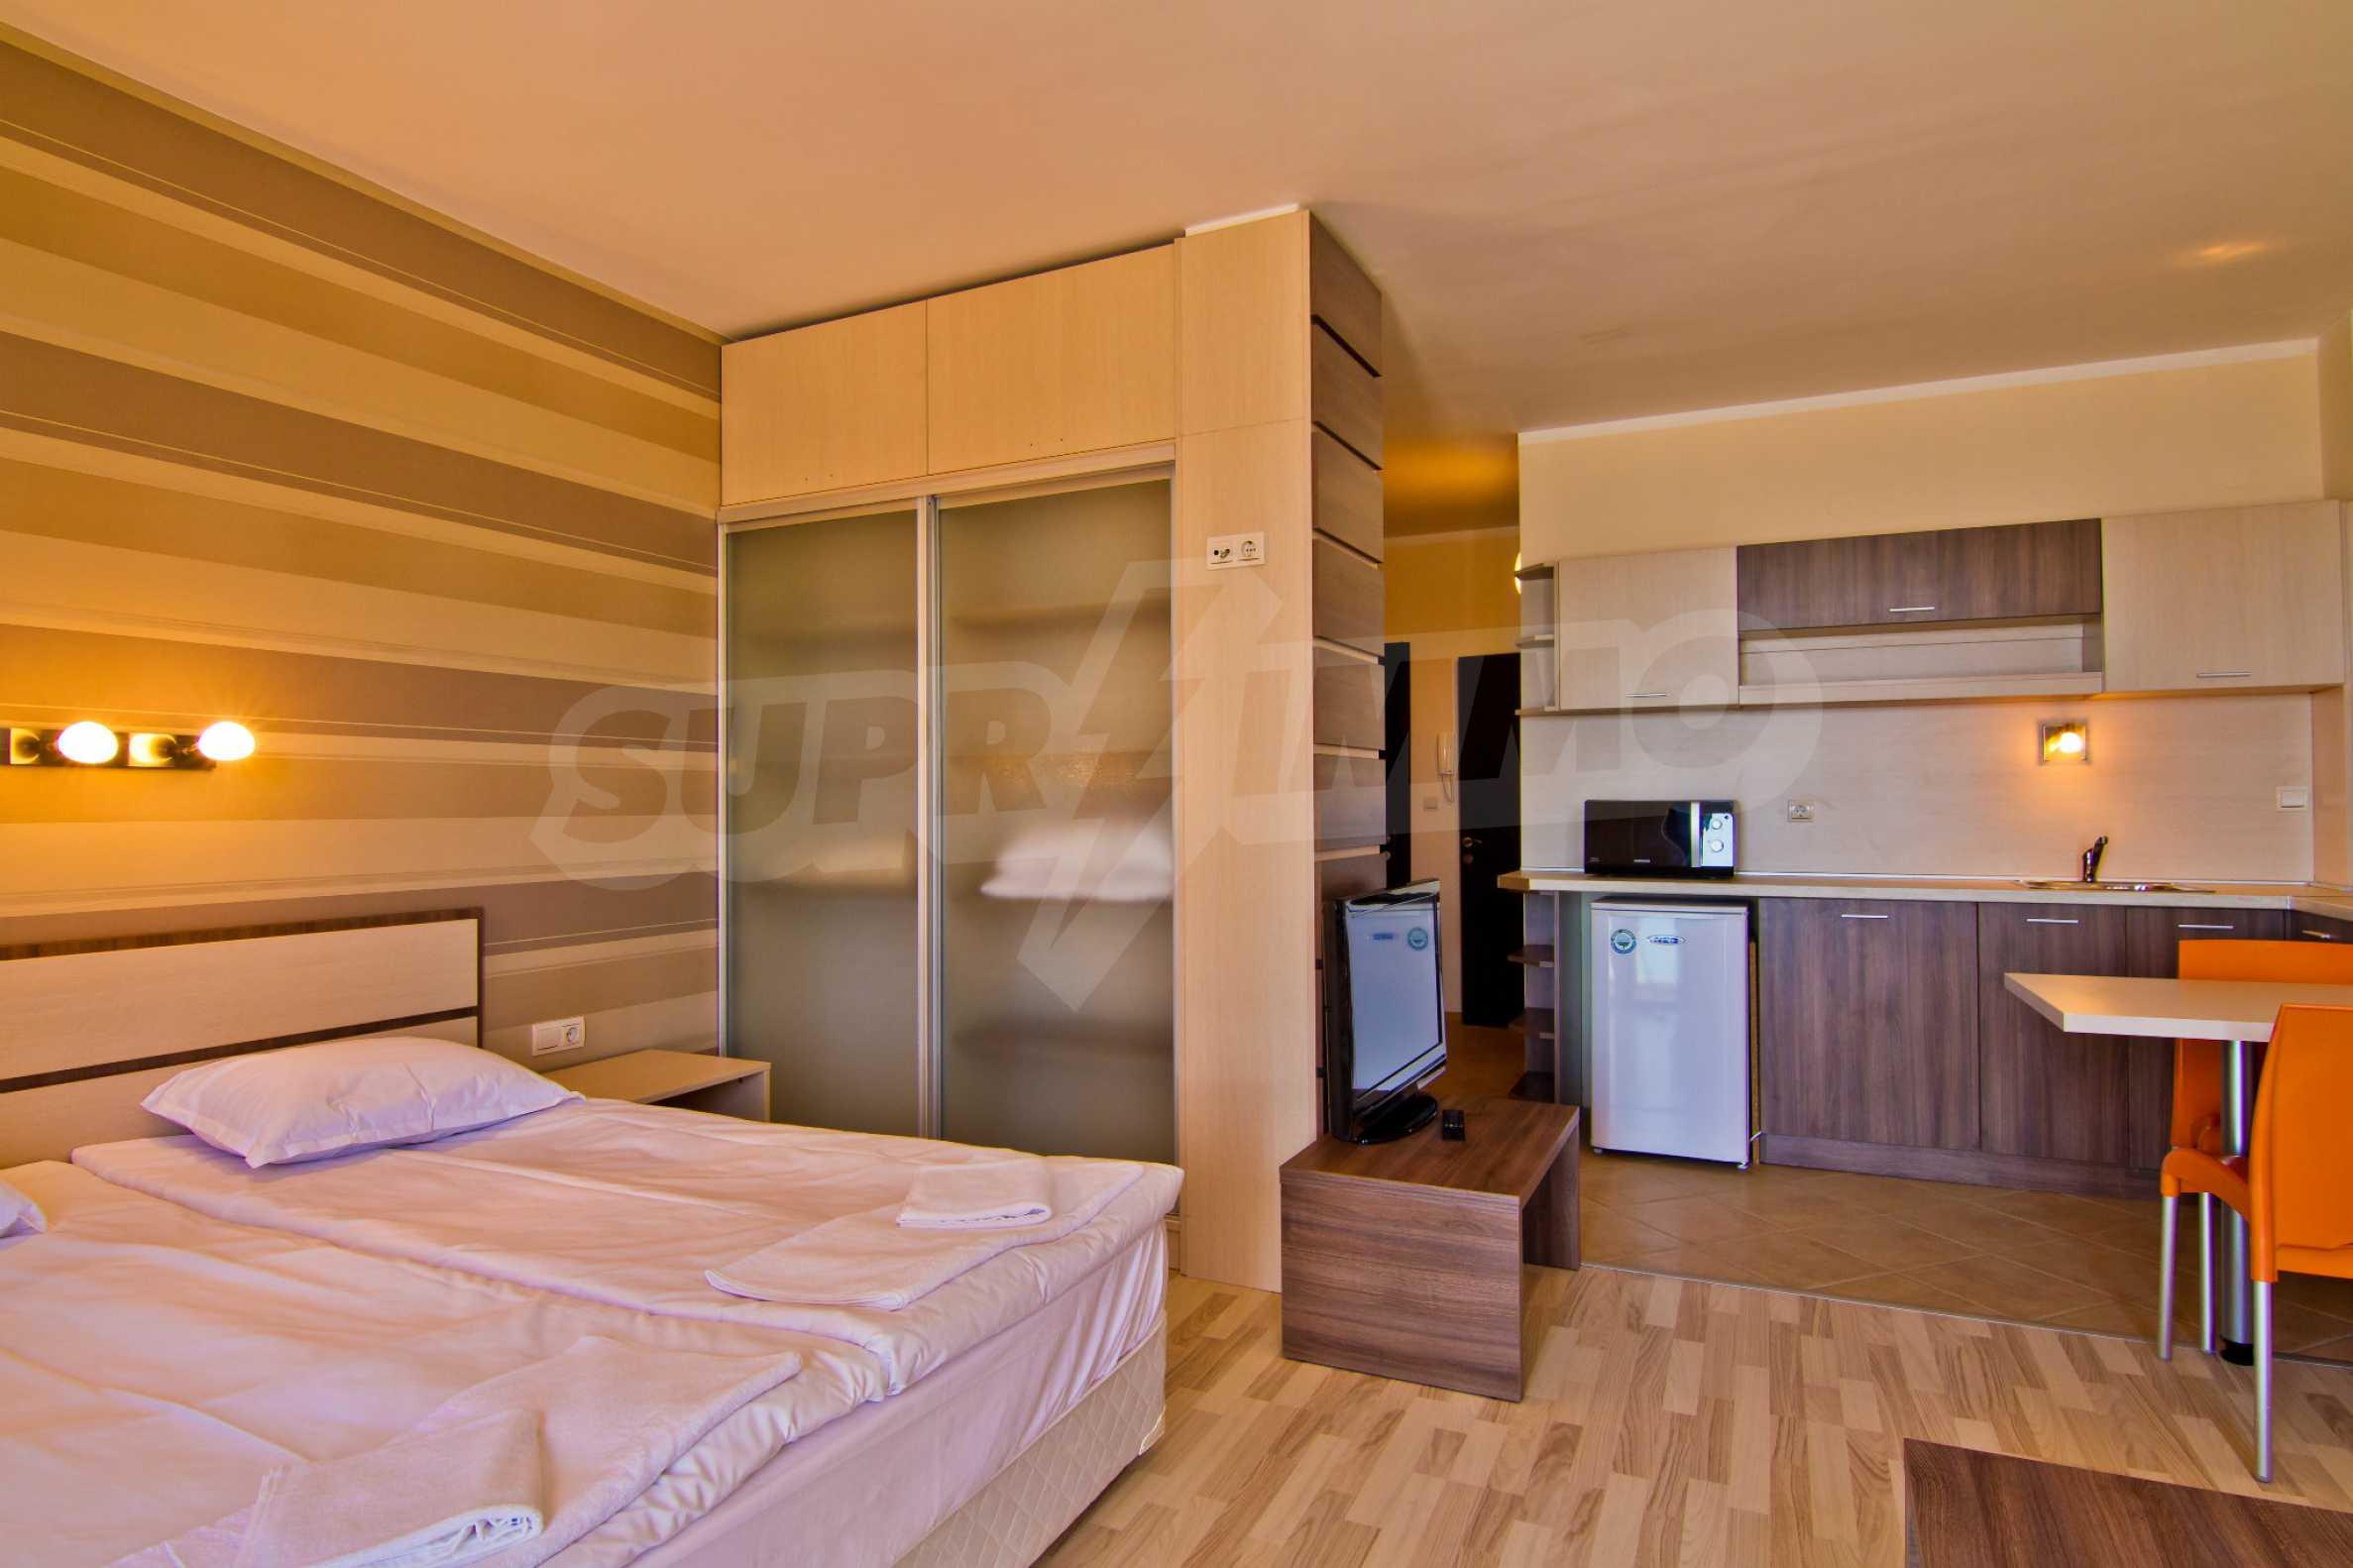 Примеа Бийч Резиденс / Primea Beach Residence 51